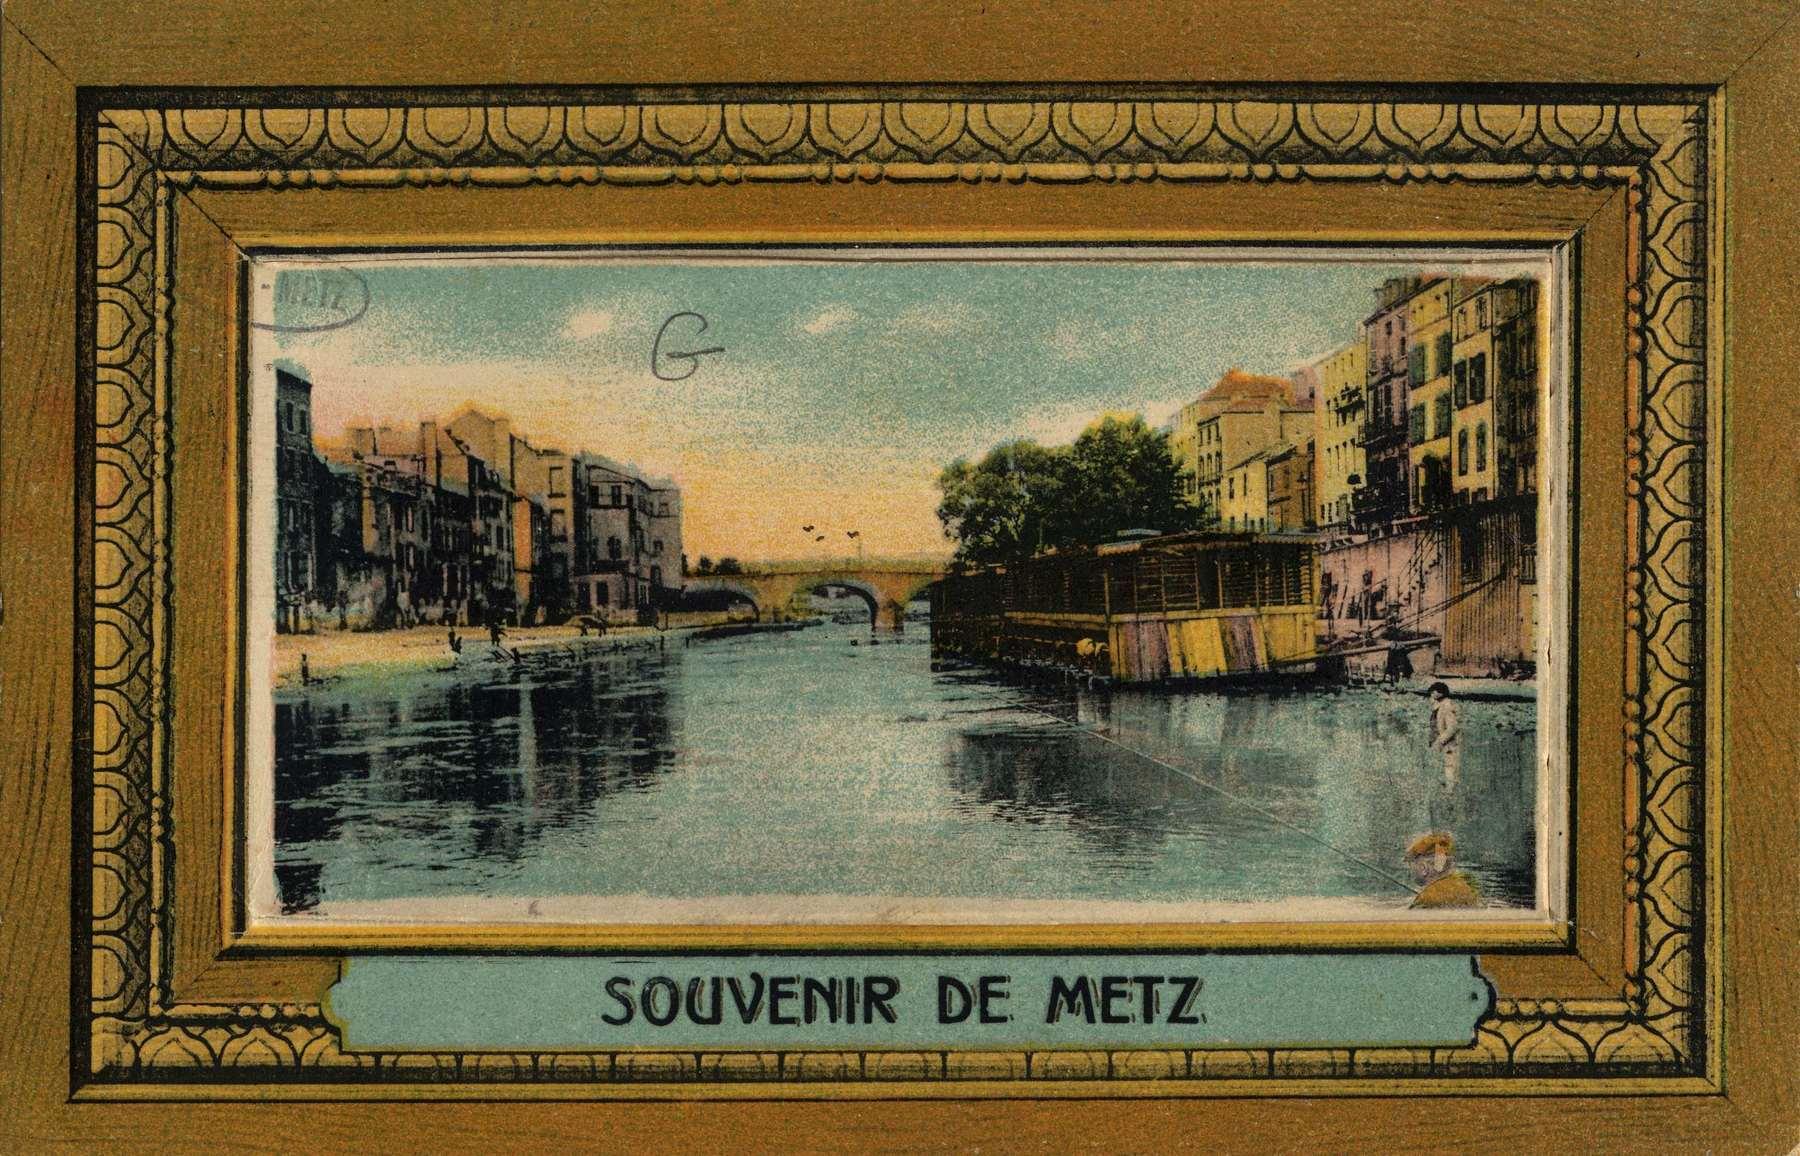 Contenu du Souvenir de Metz